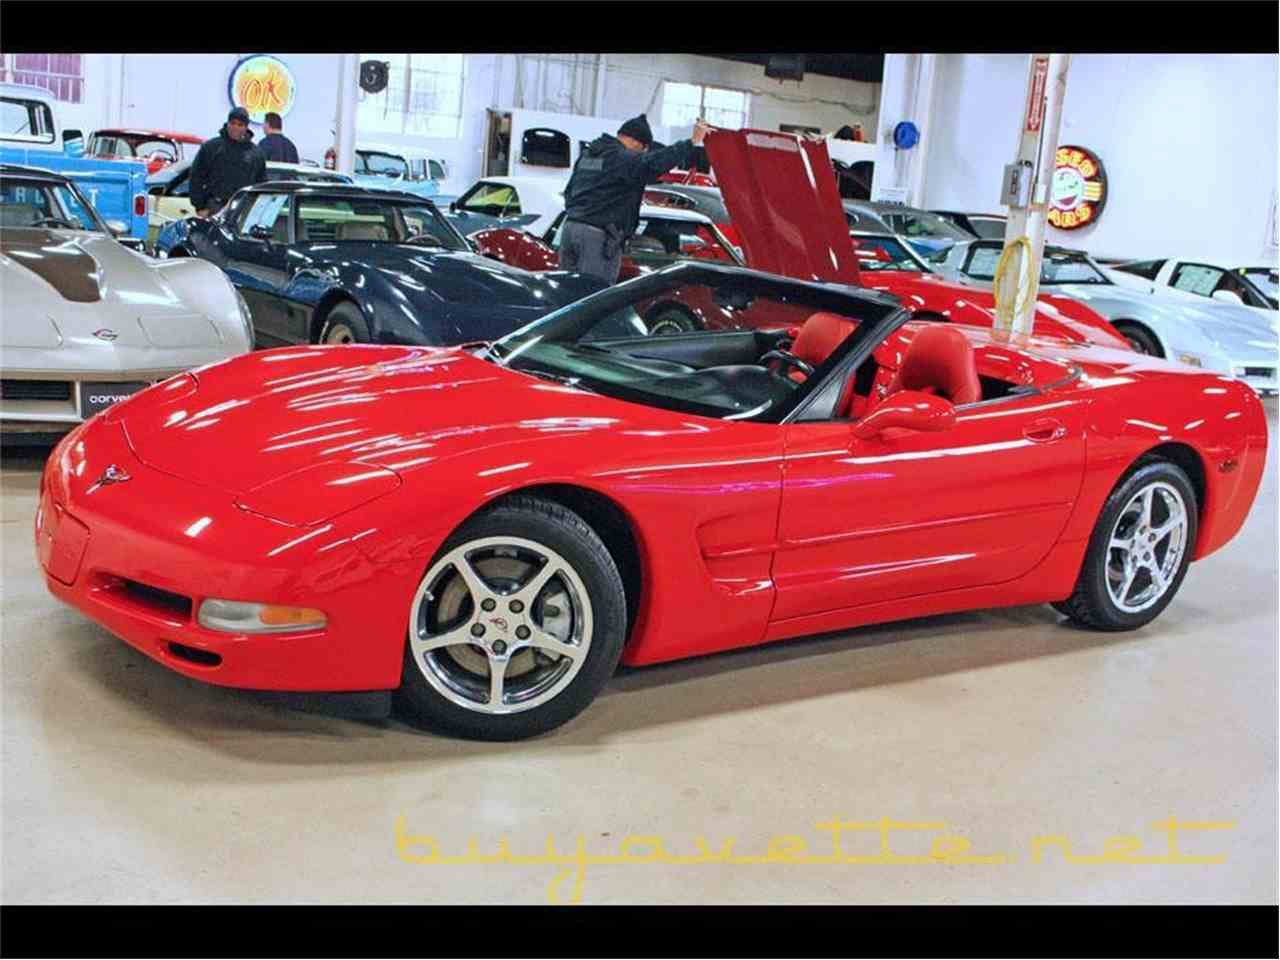 Large Picture of '02 Chevrolet Corvette - $16,999.00 - MFOA